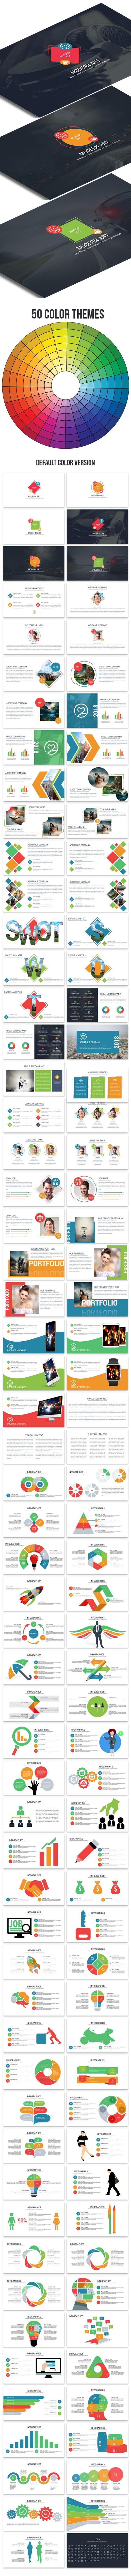 Modern Art Powerpoint Presentation - Business PowerPoint Templates